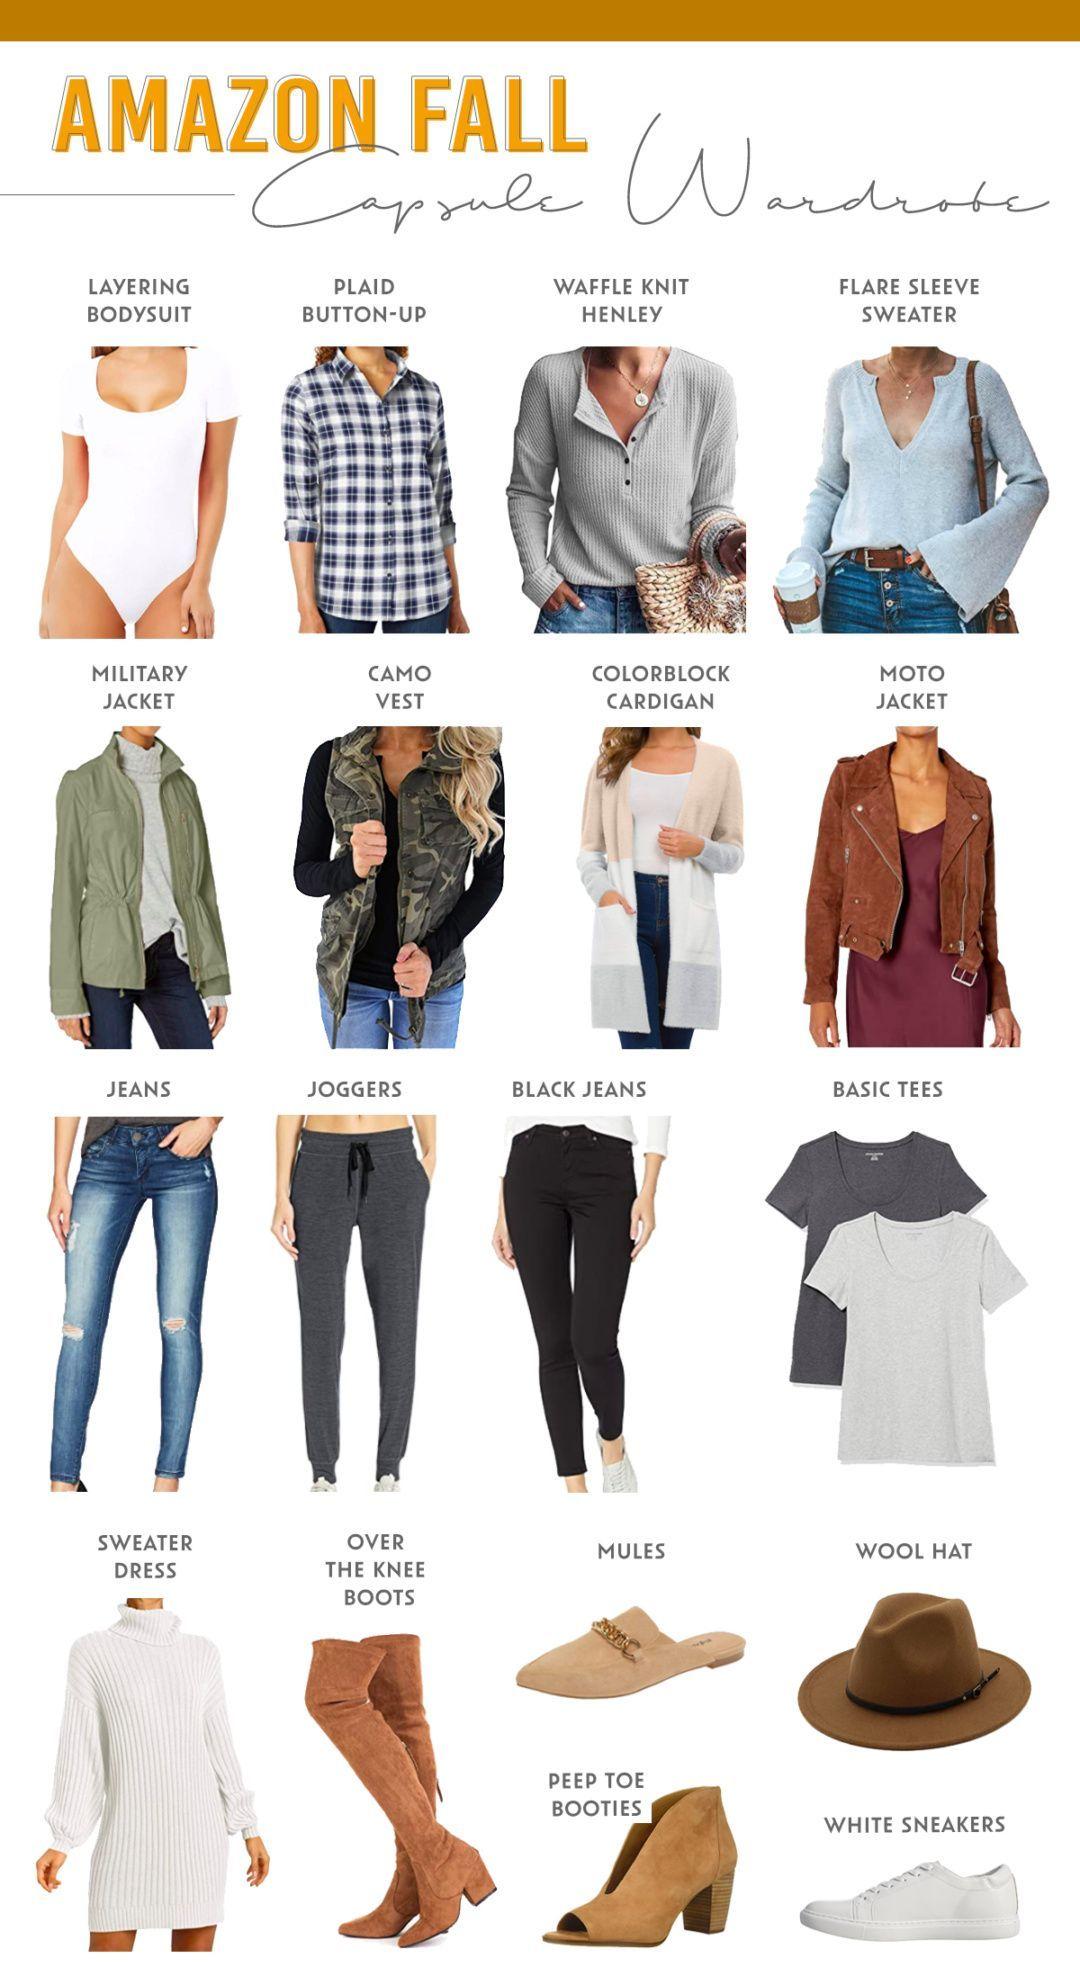 Amazon Fall Capsule Wardrobe 2020 - Pinteresting Plans